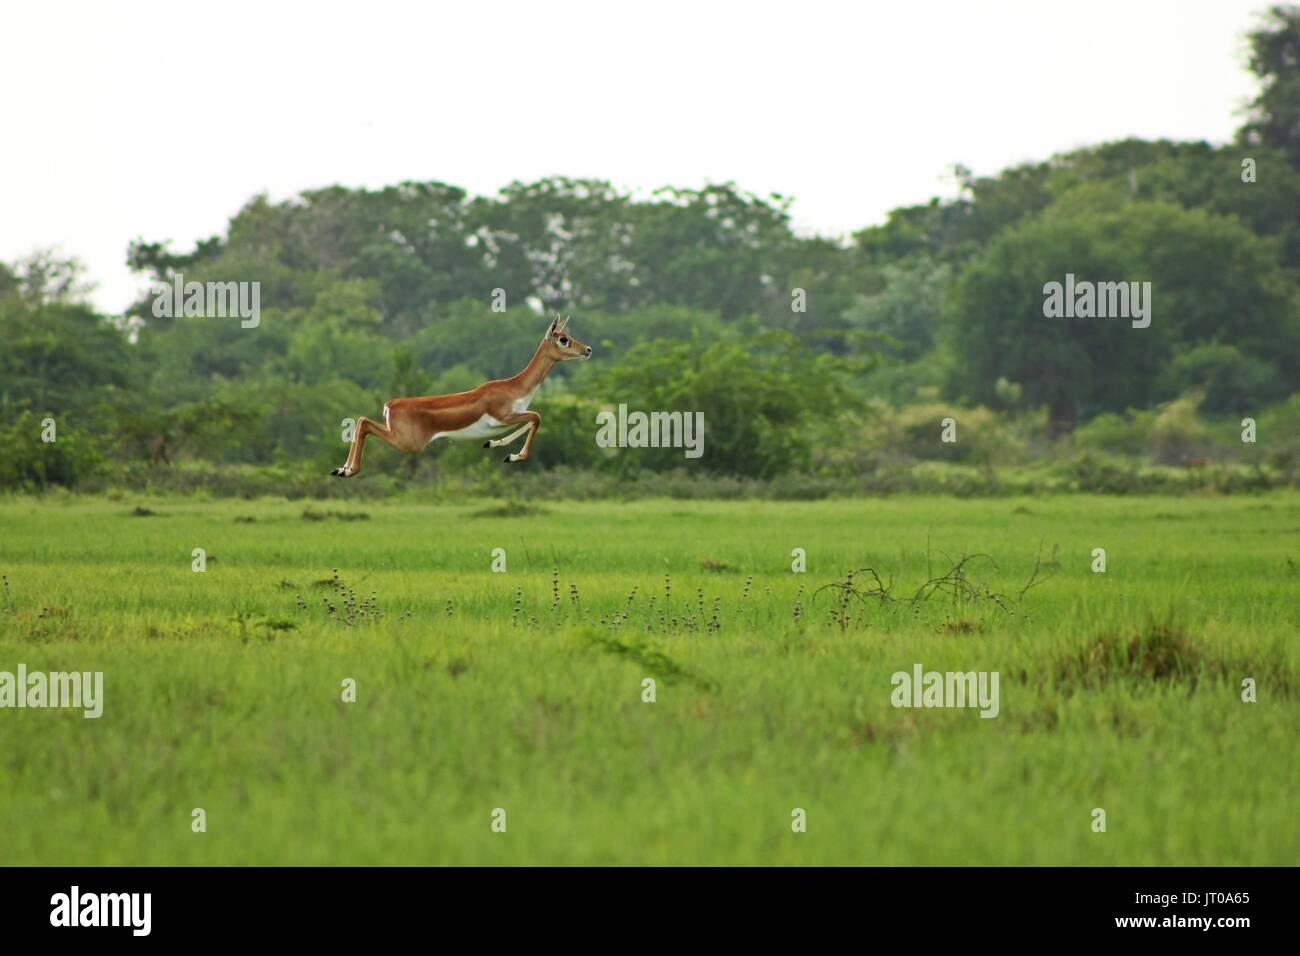 Blackbuck female jumping high in green grass - Stock Image